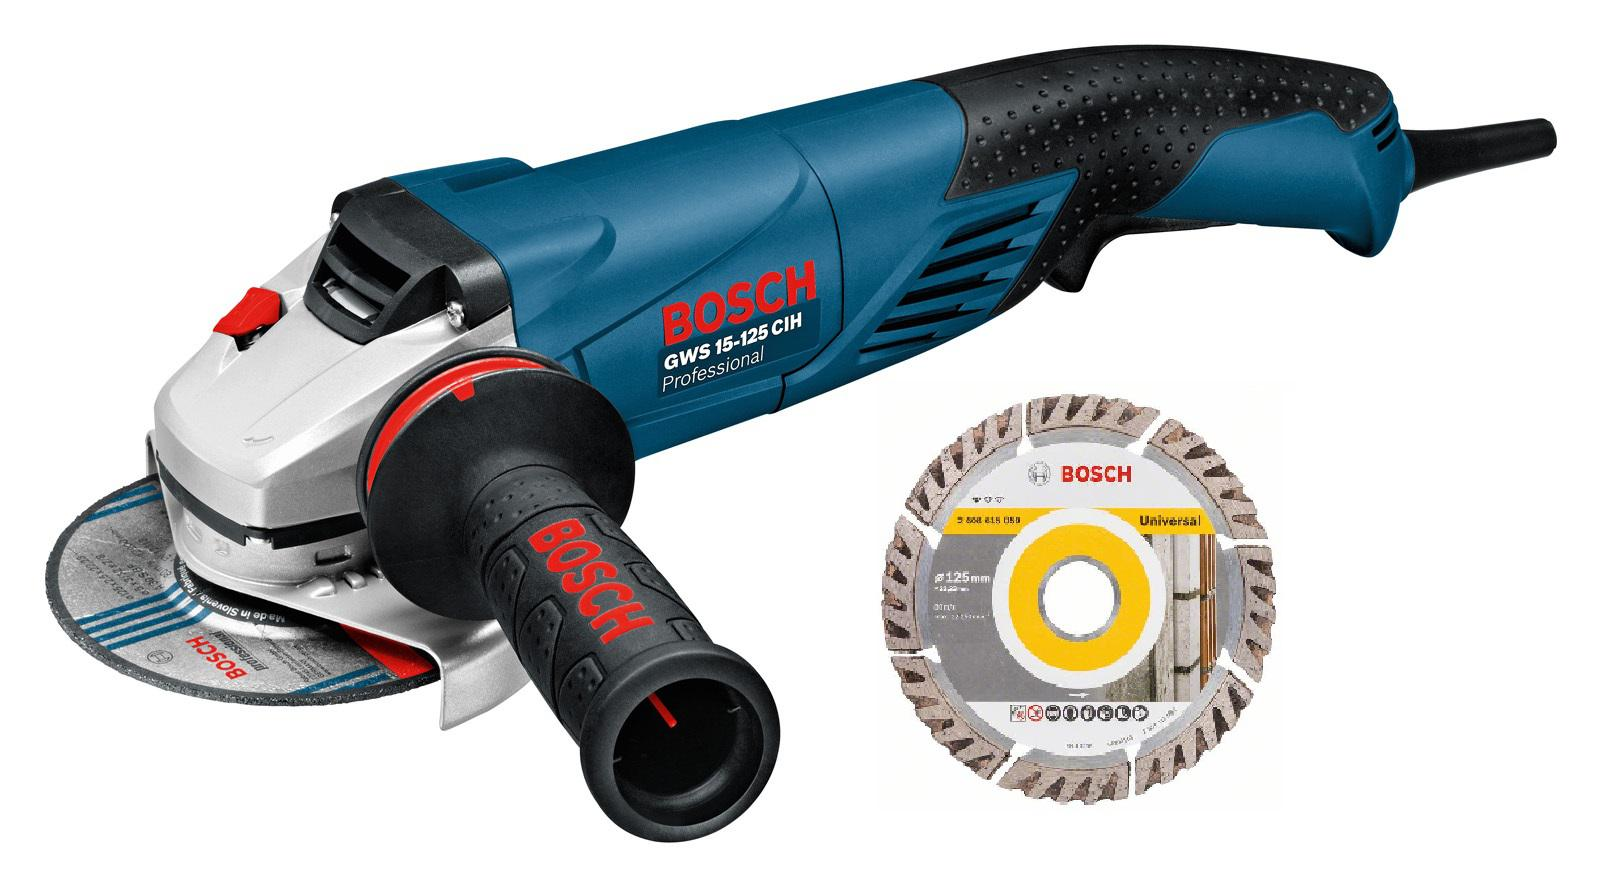 УШМ Bosch Gws 15-125 cih + Диск алм.universal 125х22мм угловая шлифовальная машина bosch gws 15 125 cih professional